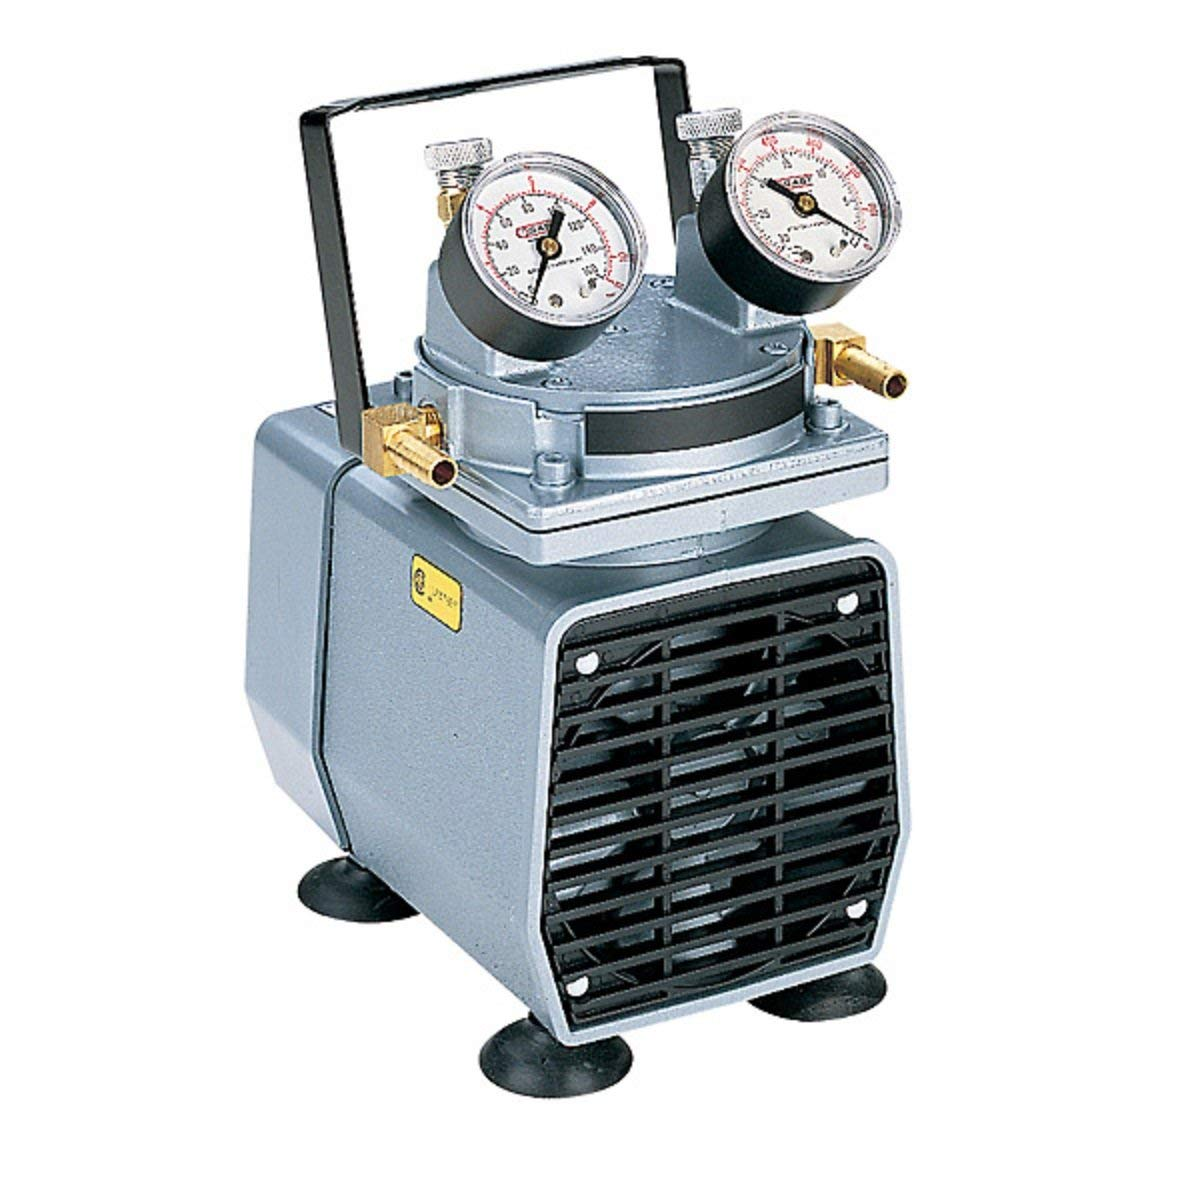 Gardco DP-173869 Vacuum Pump, Rotary Vane, Metal Housing, 115V